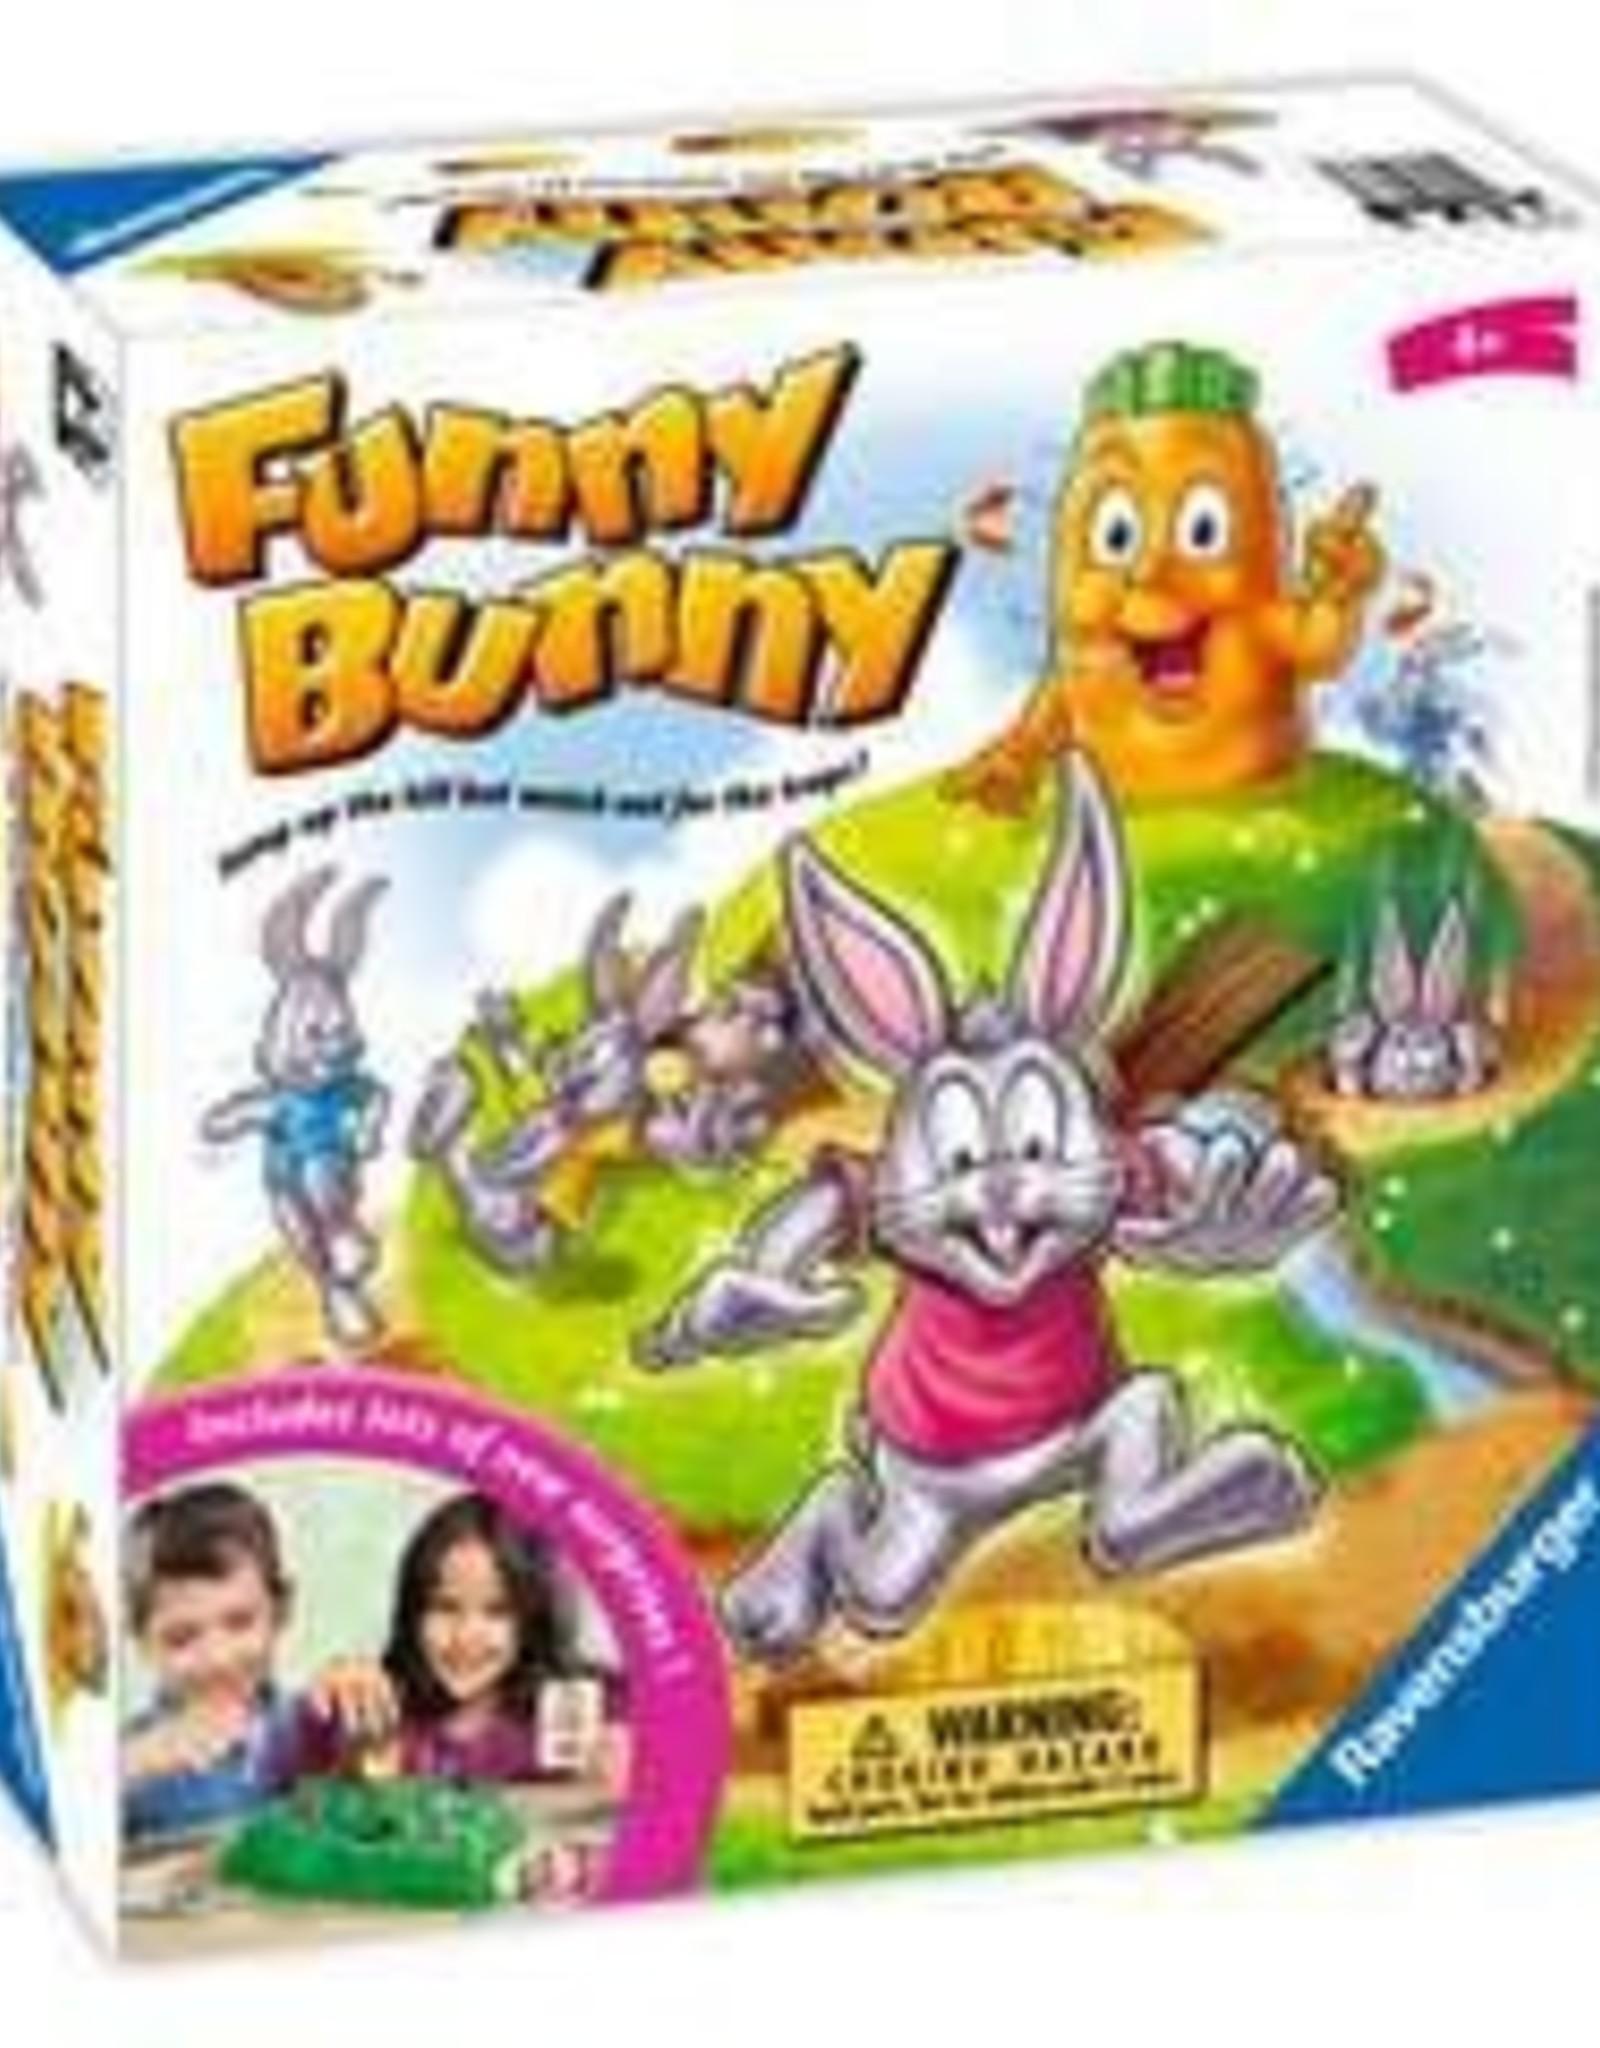 Ravensburger Funny Bunny